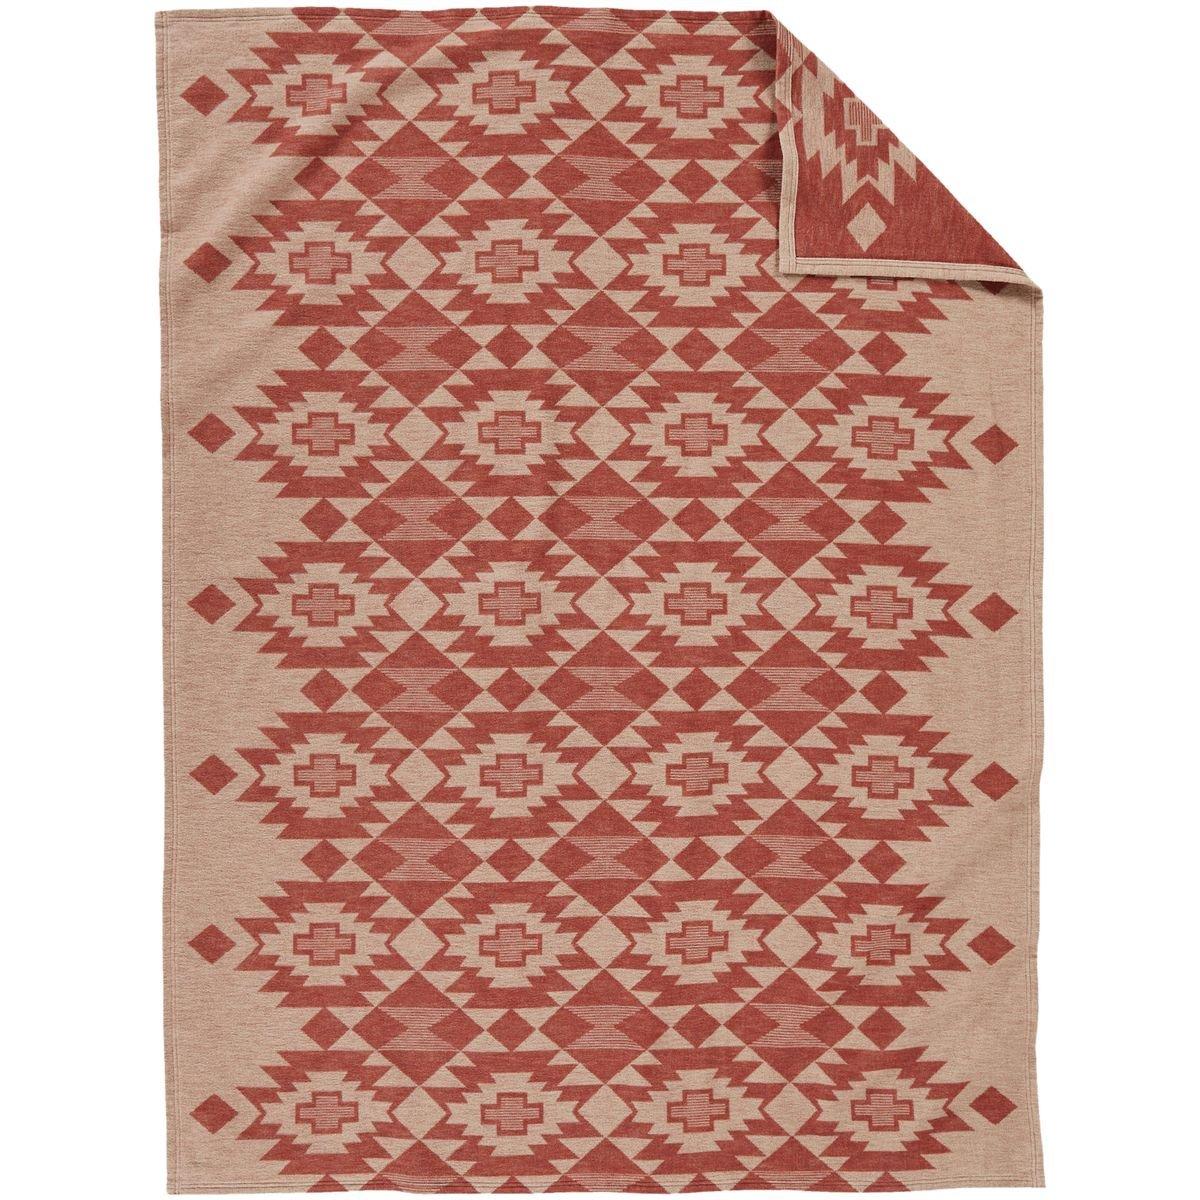 Pendleton Yuma Star Clay Organic Cotton King Blanket